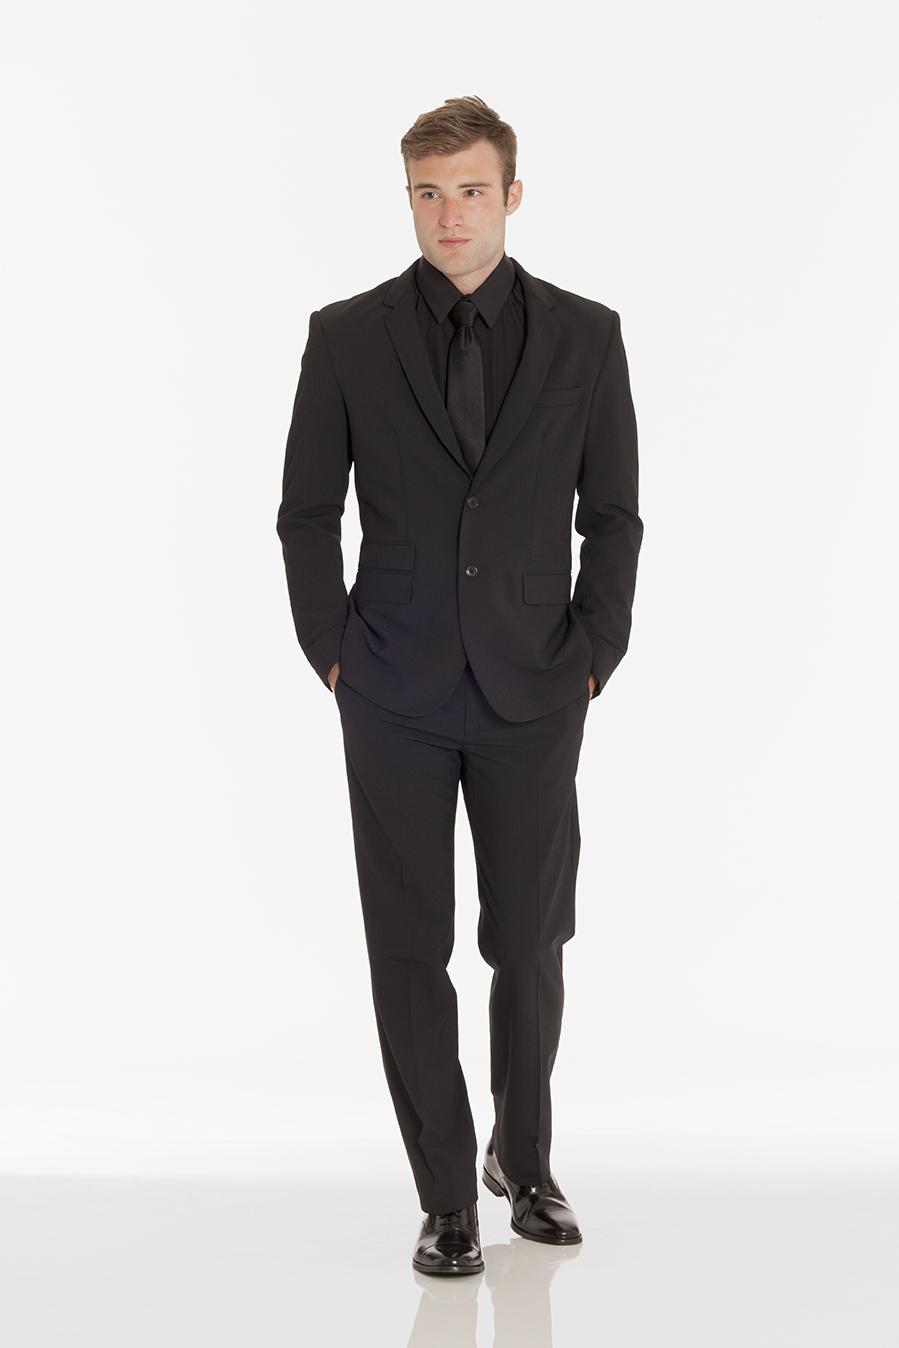 Jacket 422 Shirt 1053 Pant 297 Tie 1422